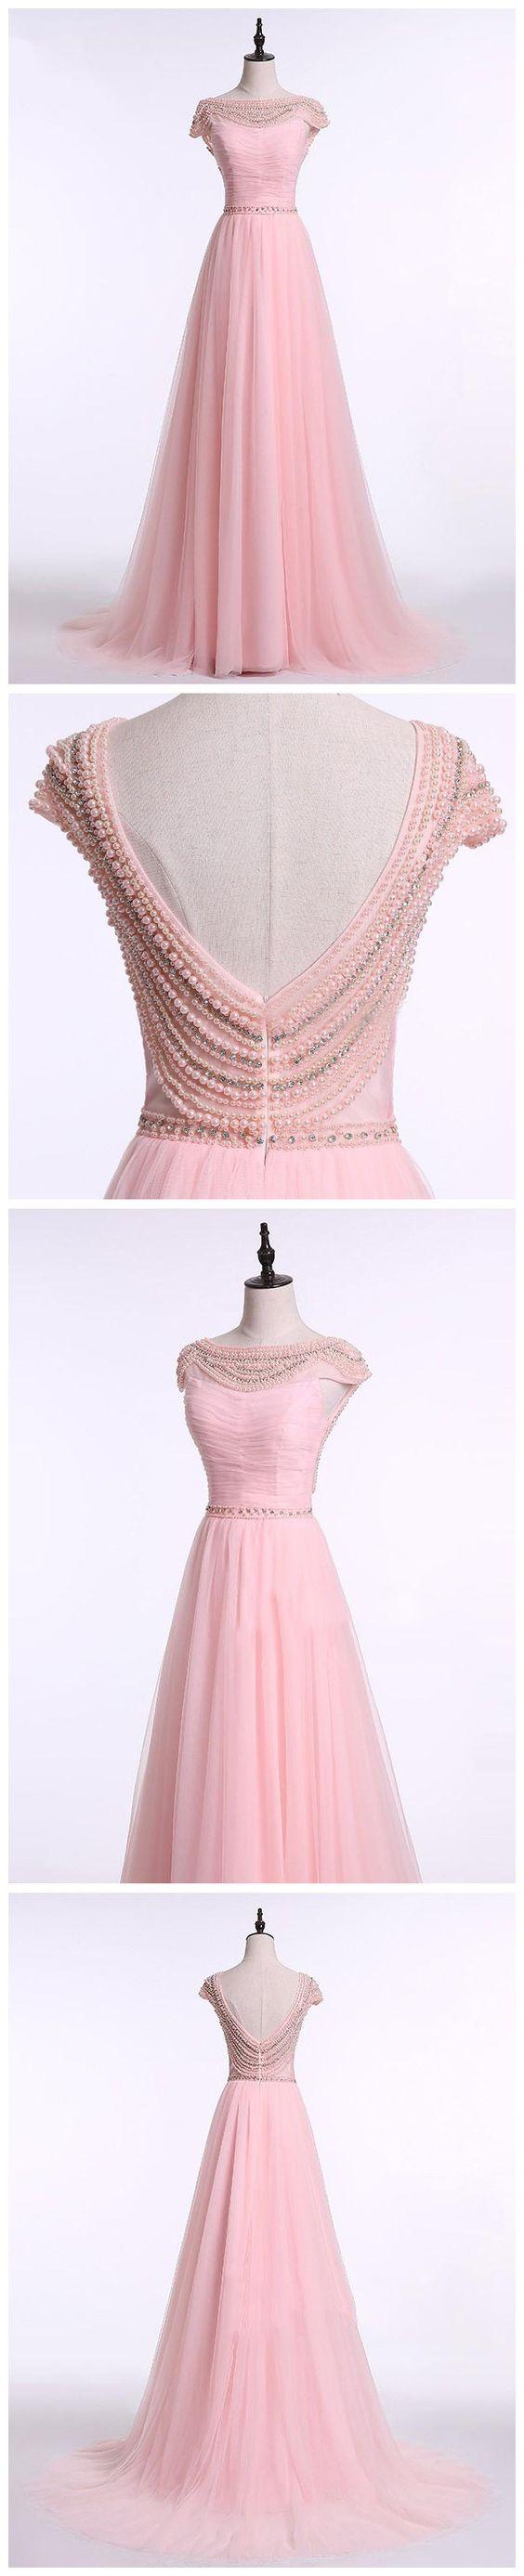 prom dresses long,prom dresses pink,prom dresses cheap,cute prom ...